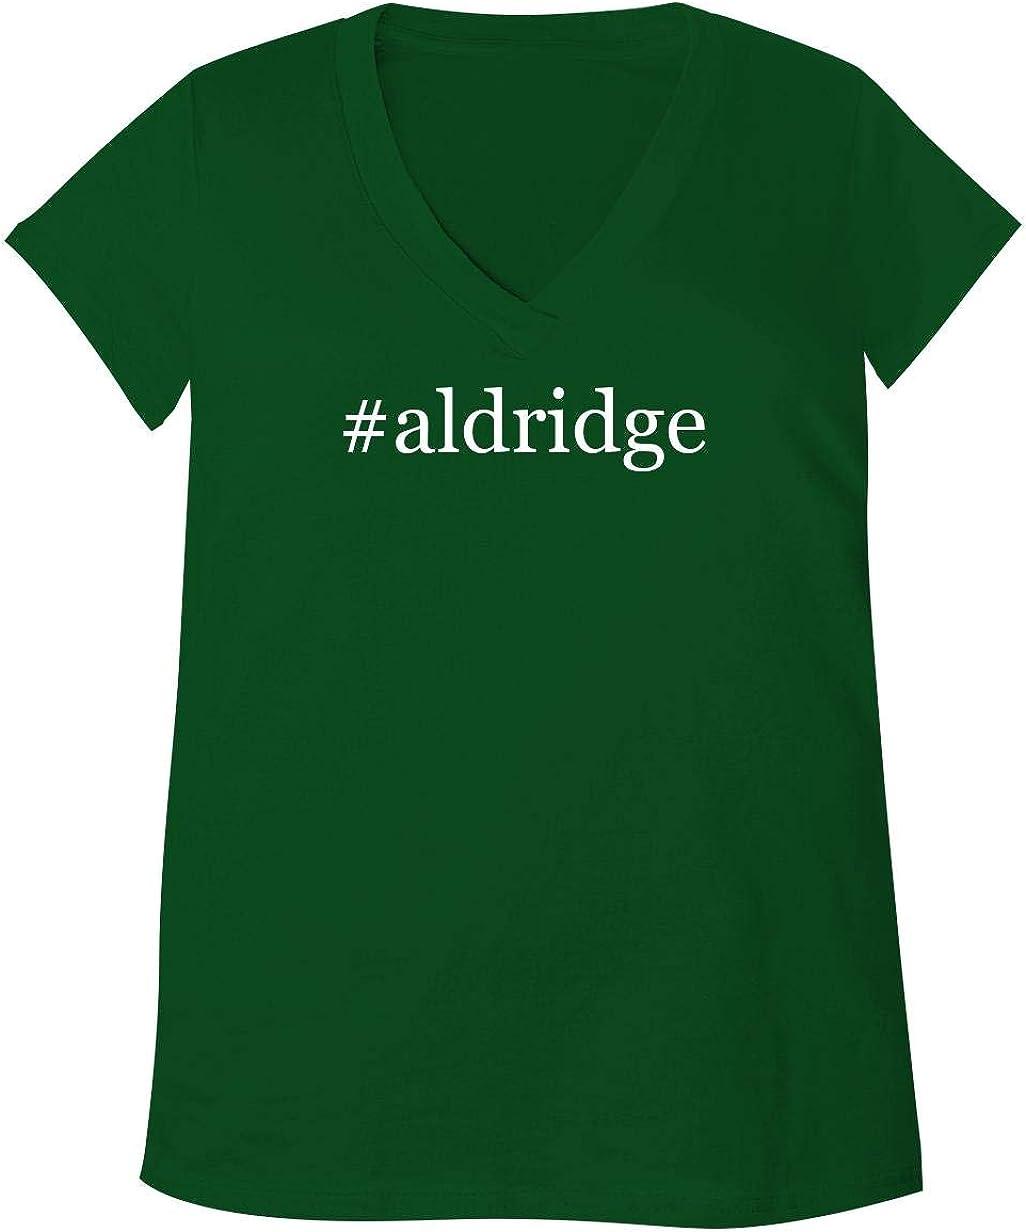 #Aldridge - Adult Bella + Canvas B6035 Women's V-Neck T-Shirt 51KxP8lPrlL